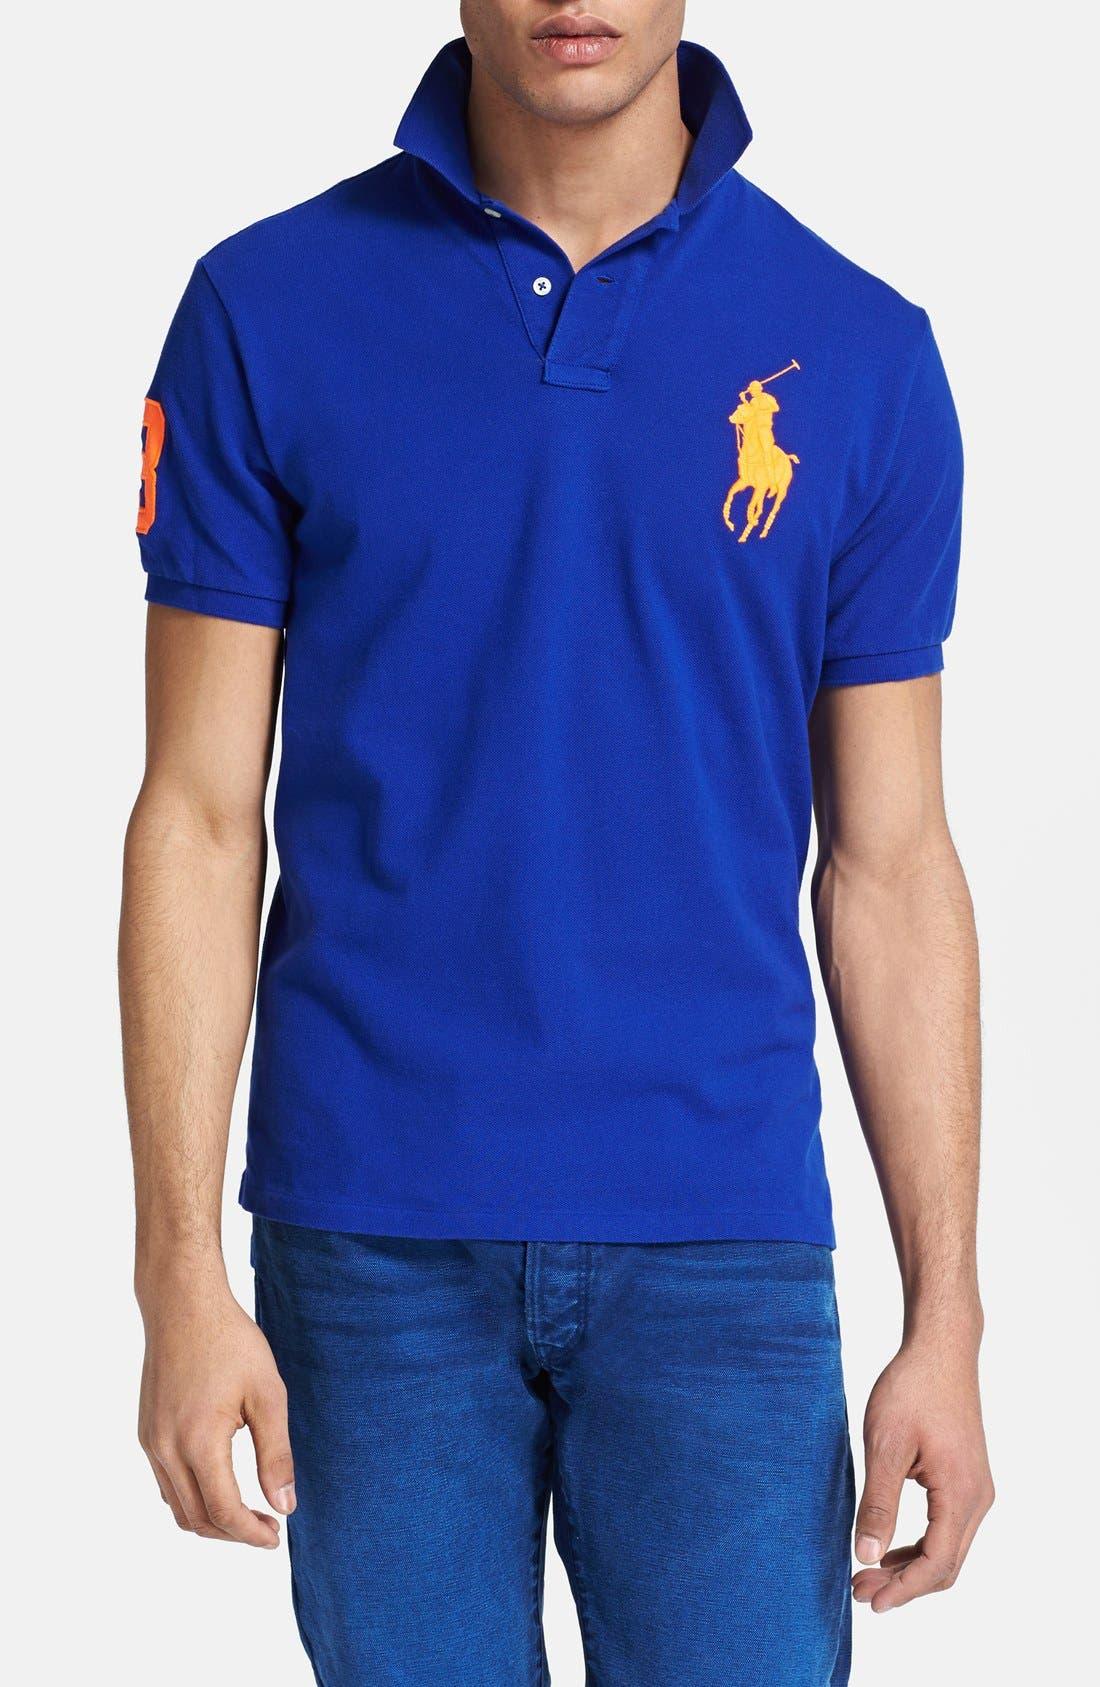 7f28d164 ... promo code for ralph lauren big pony 3 polo shirt 5076c c8819